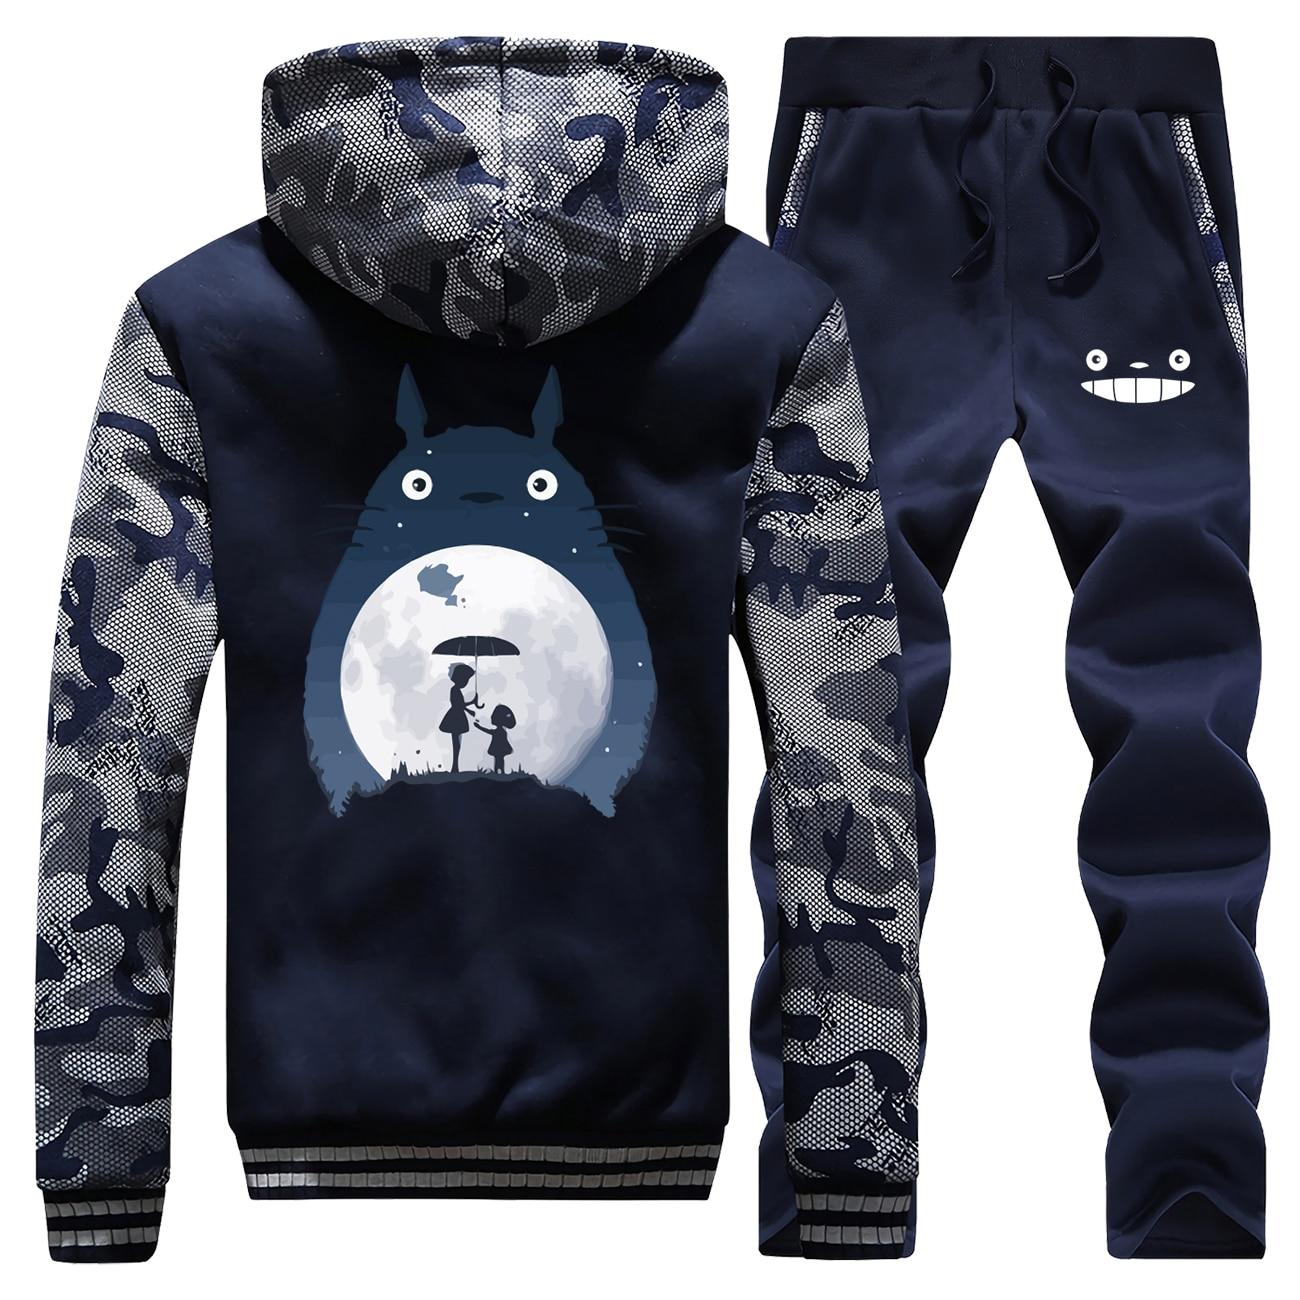 Winter 2019 New Japan Cartoon Cute Totoro Sportswear Men Hooded Thick Suit Anime Print Sweatshirt Camouflage+Pants 2 Piece Set